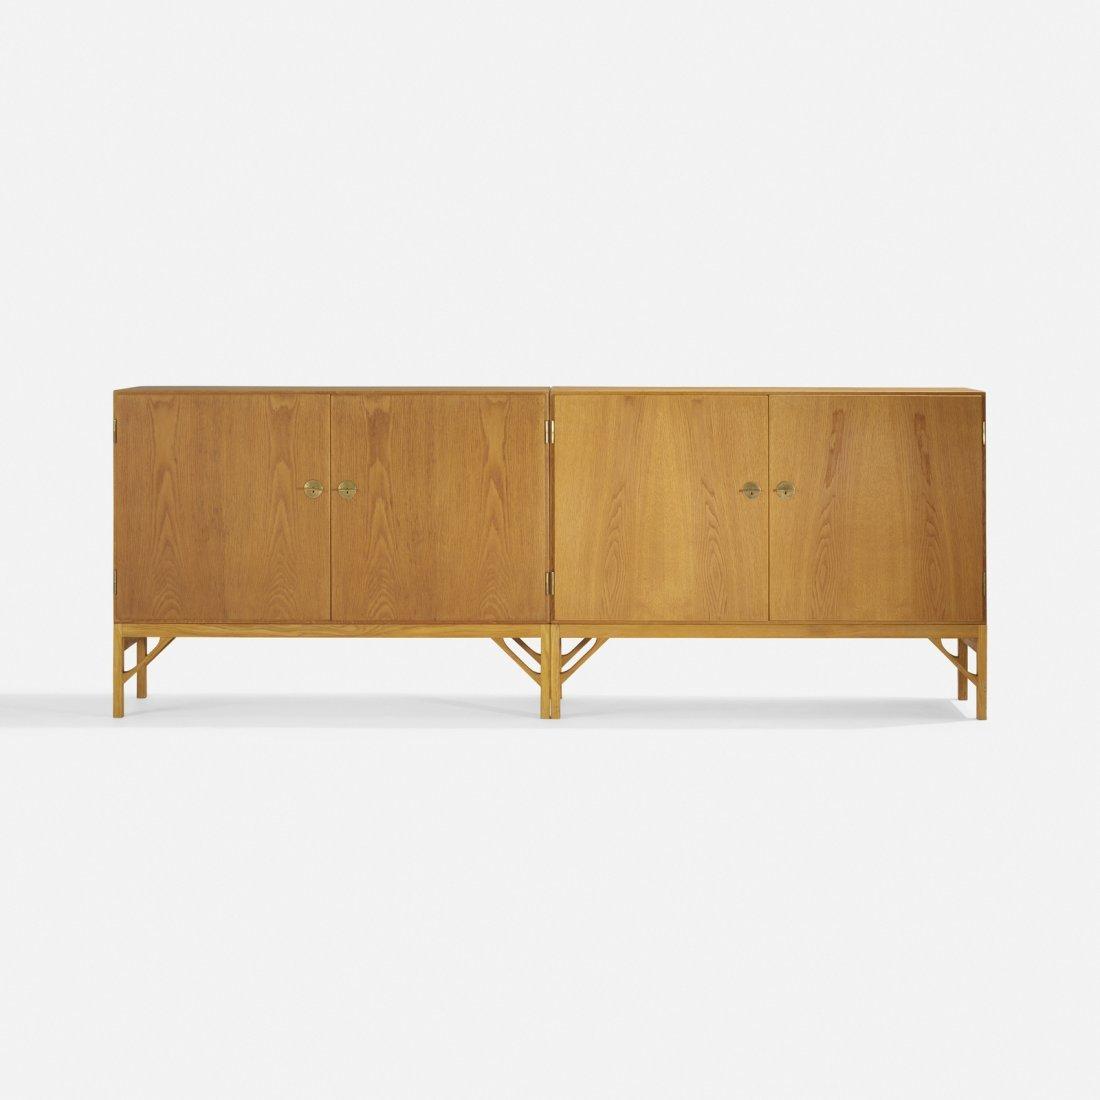 Borge Mogensen, cabinets model A232, pair